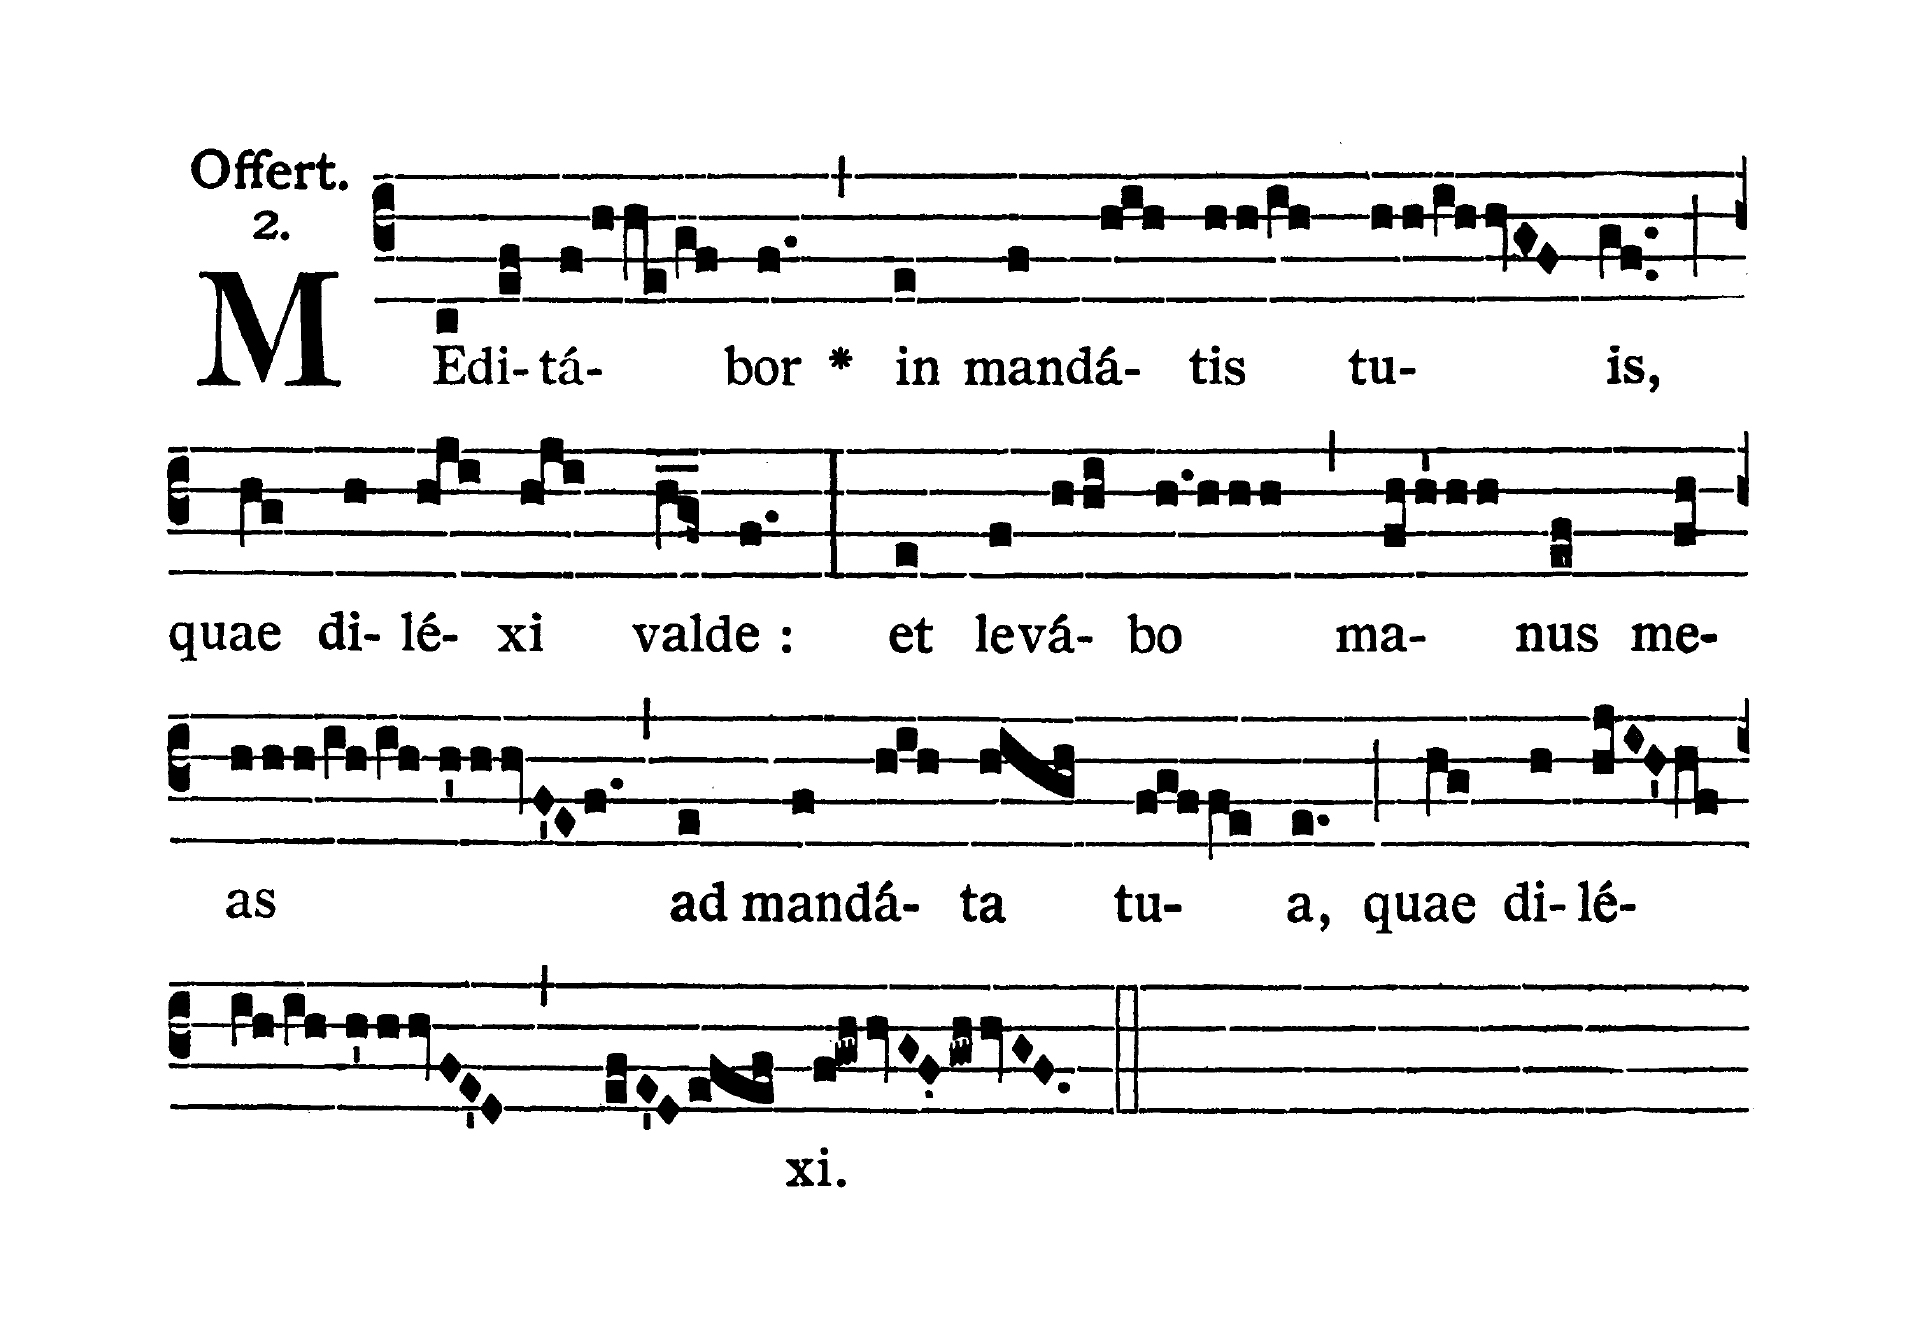 Feria IV Quatuor Temporum Septembris (Środa suchych dni wrześniowych) - Offertorium (Meditabor)